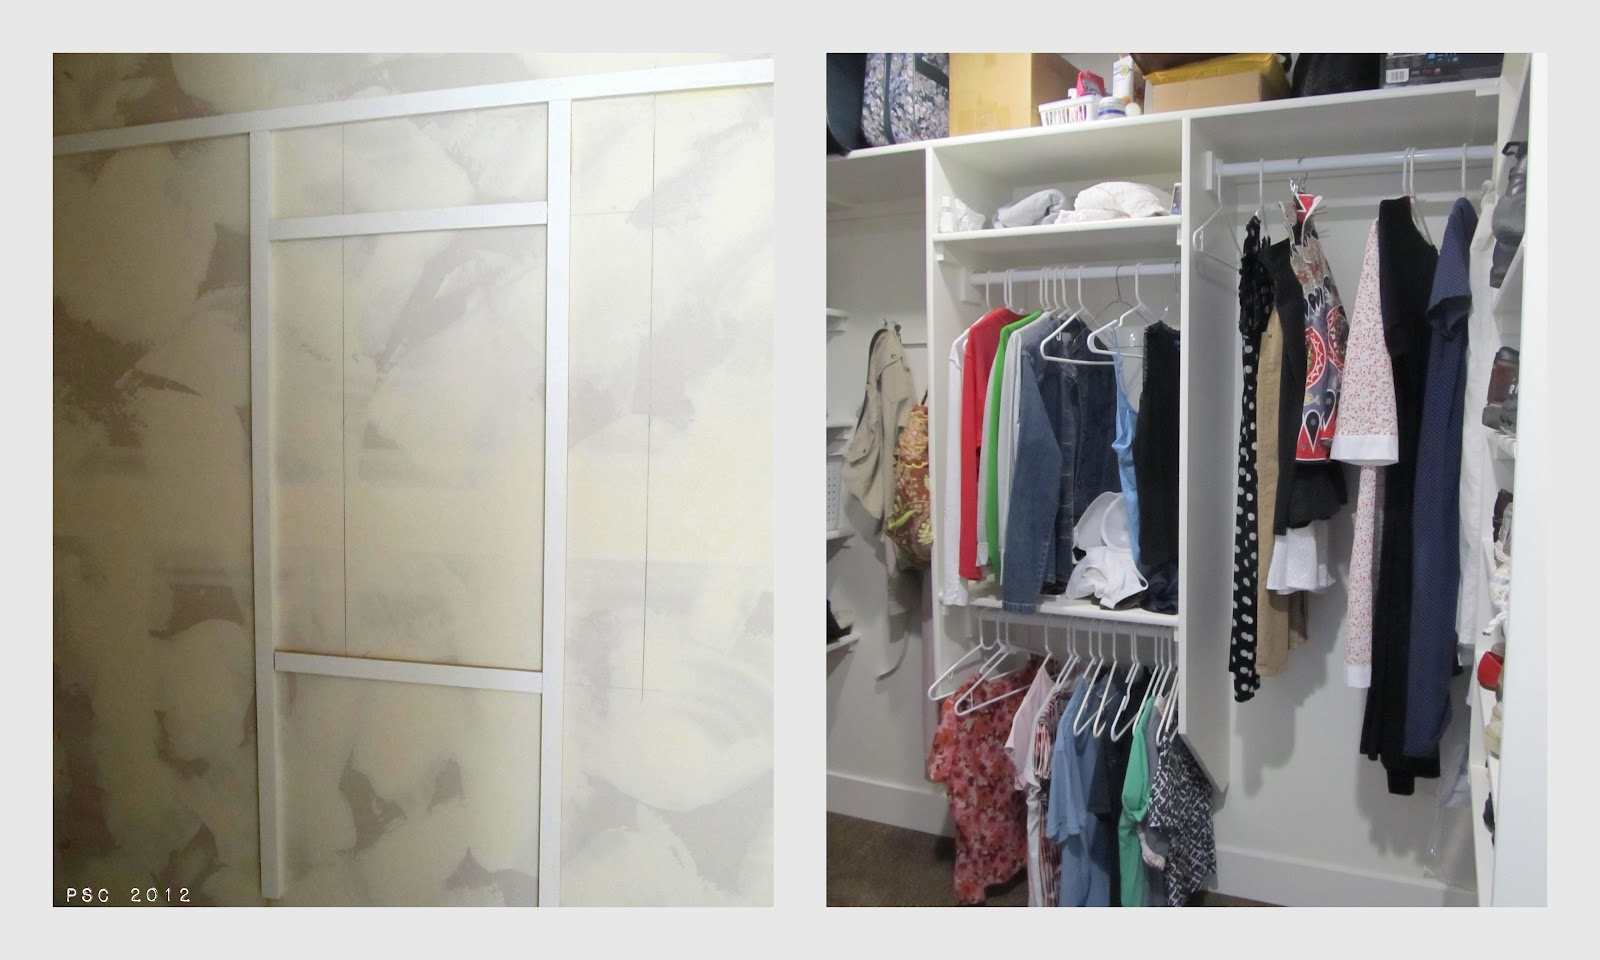 Pickup Some Creativity: Tips for DIY Closet Shelving